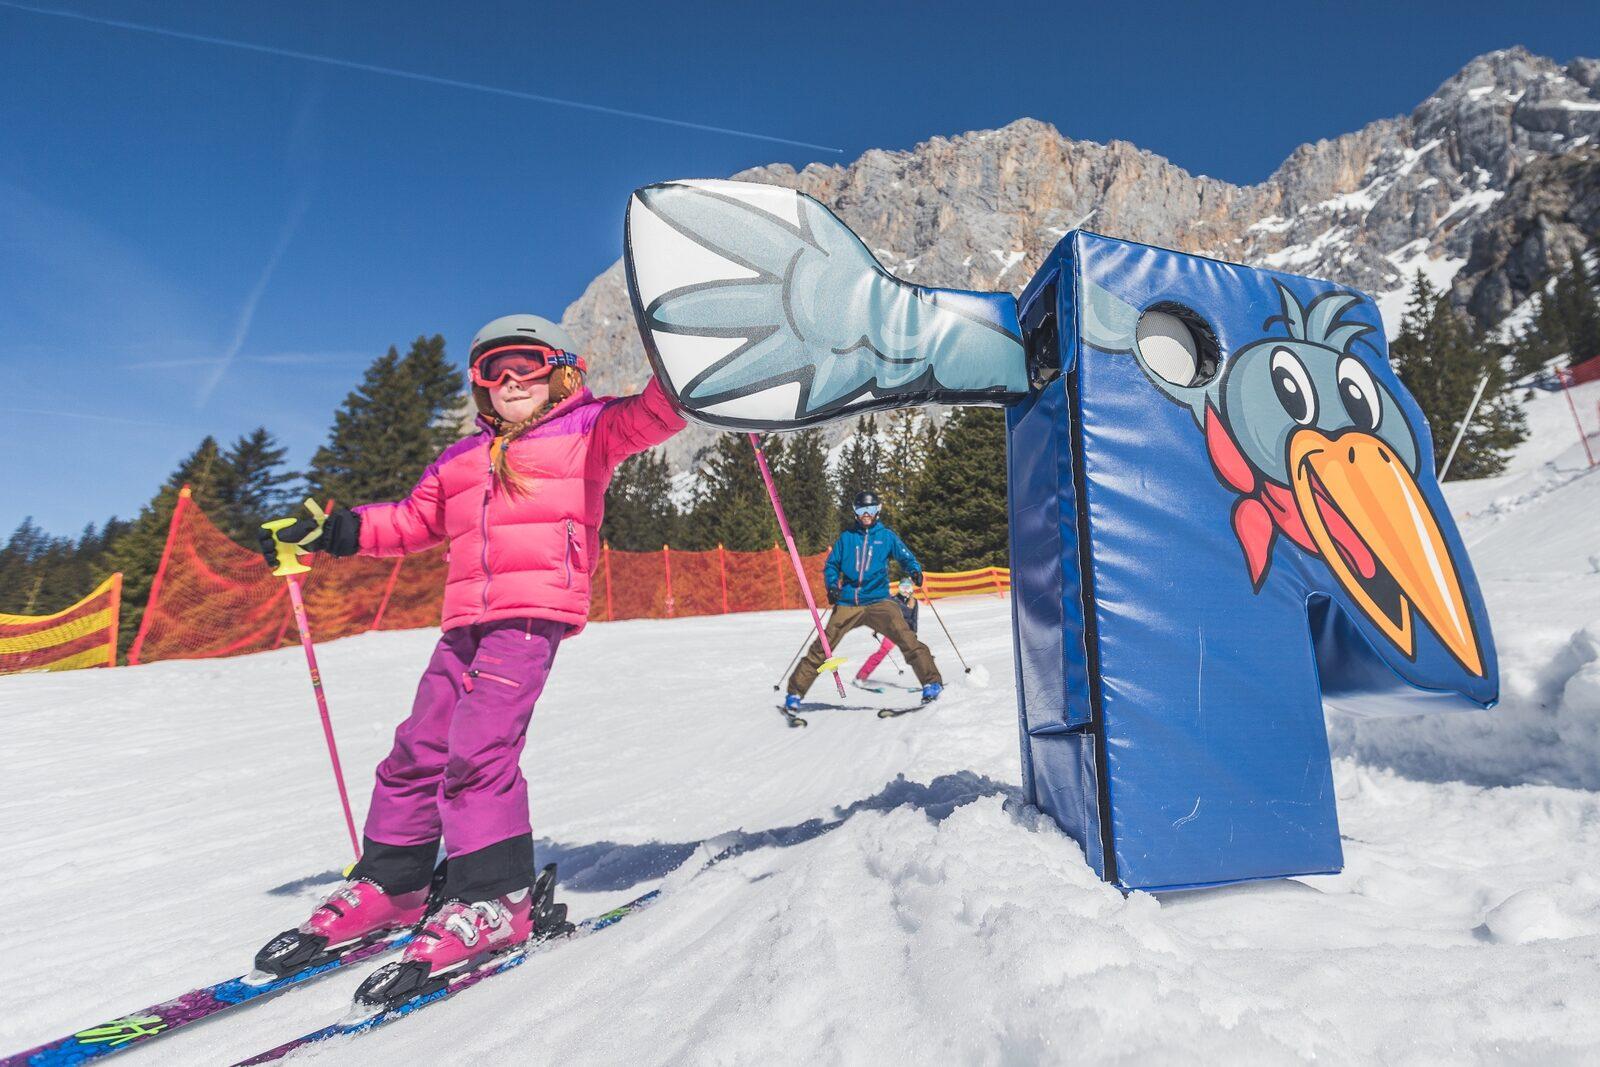 Ski area Ehrwalder Alm